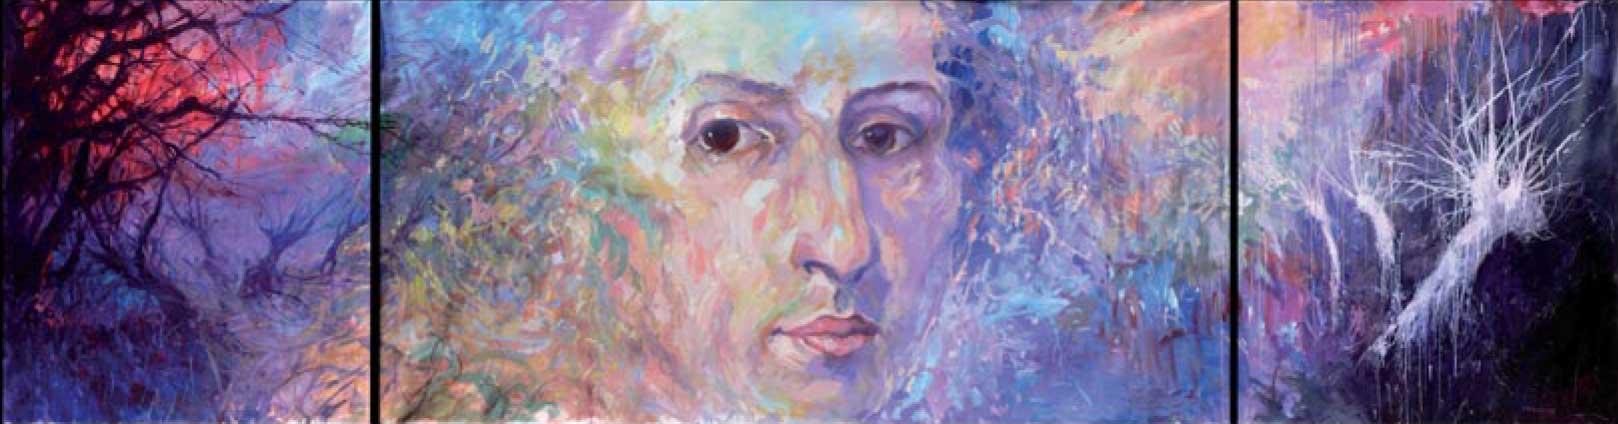 La nuit Chopin